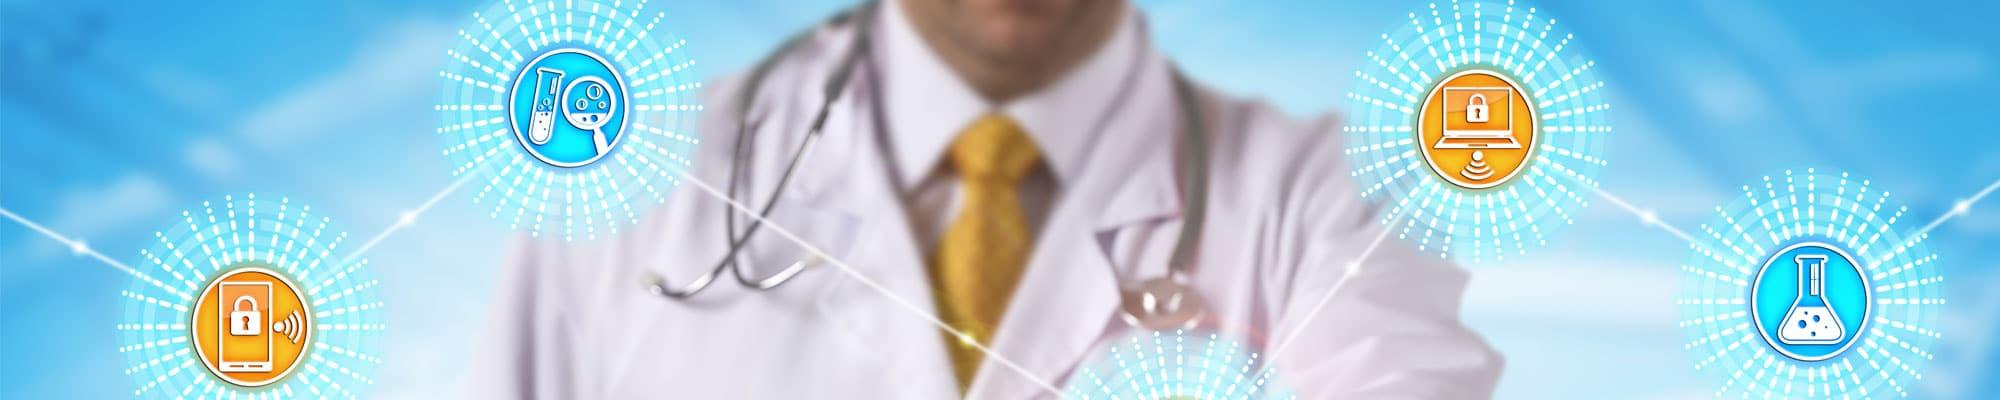 Unrecognizable Clinical Trials